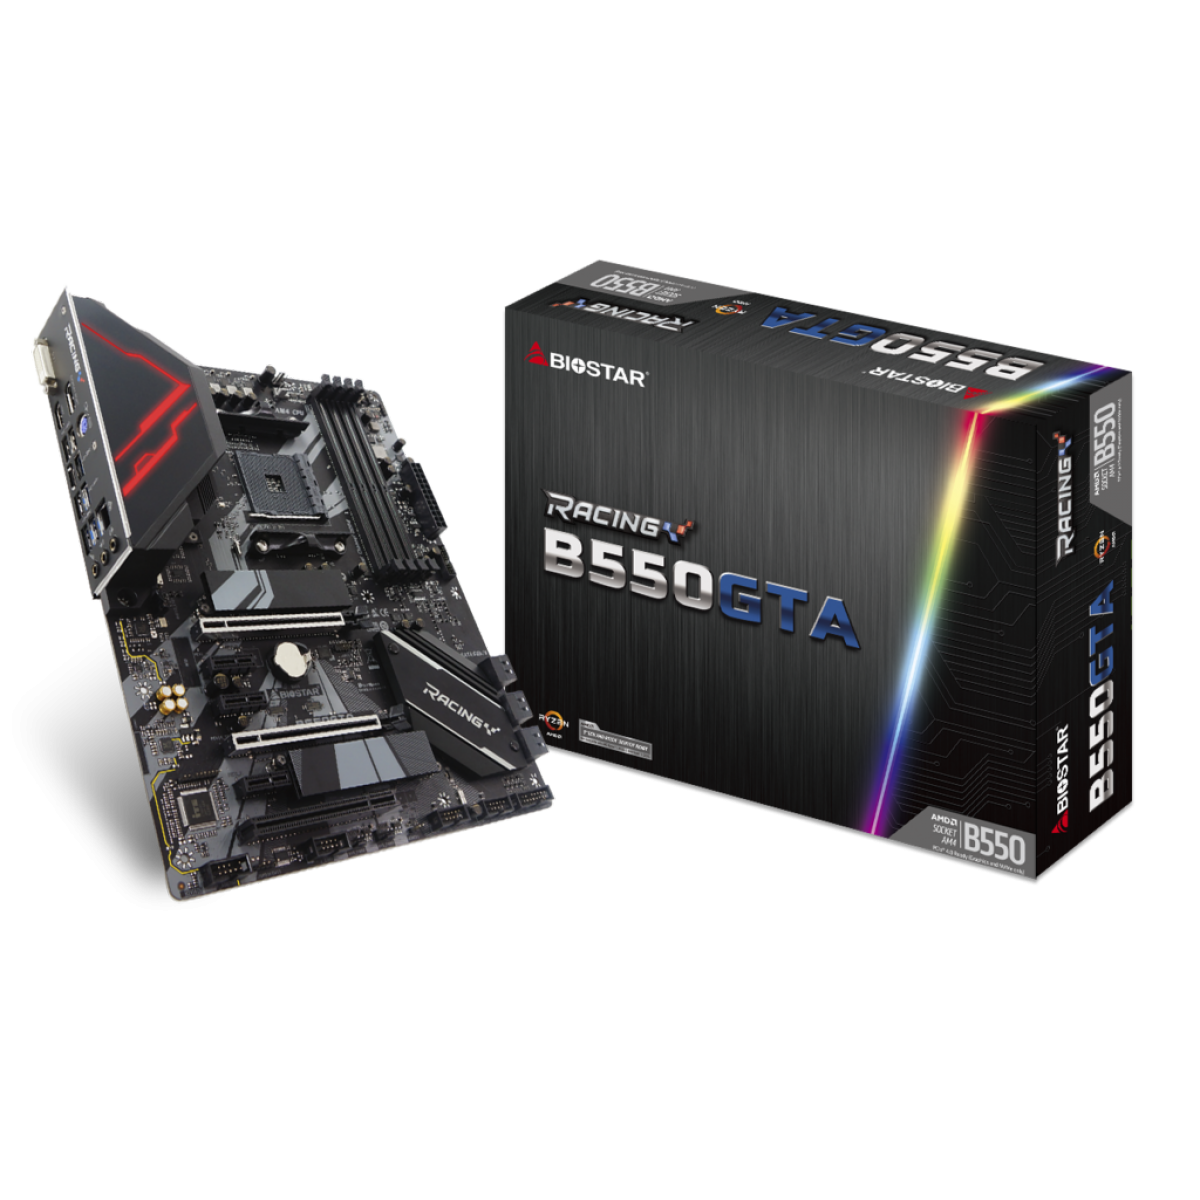 Placa Mãe Biostar Racing B550GTA, Chipset B550, AMD AM4, ATX, DDR4